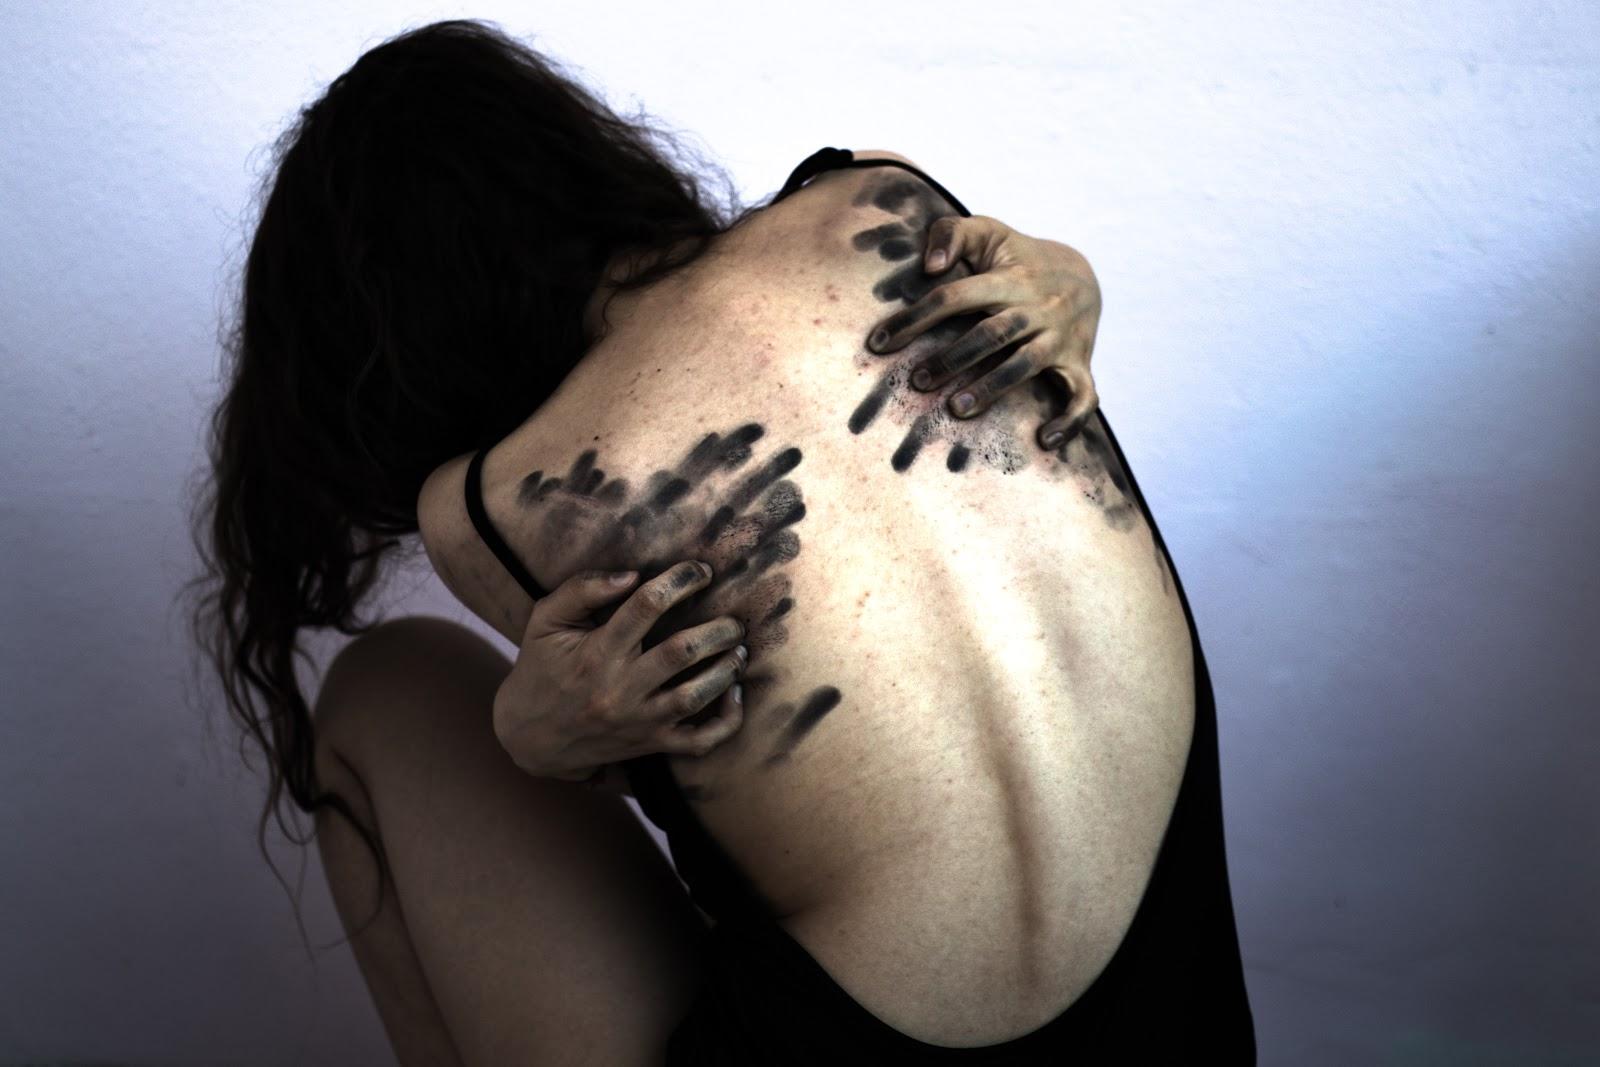 Storie Vere – Myriam Iannotta